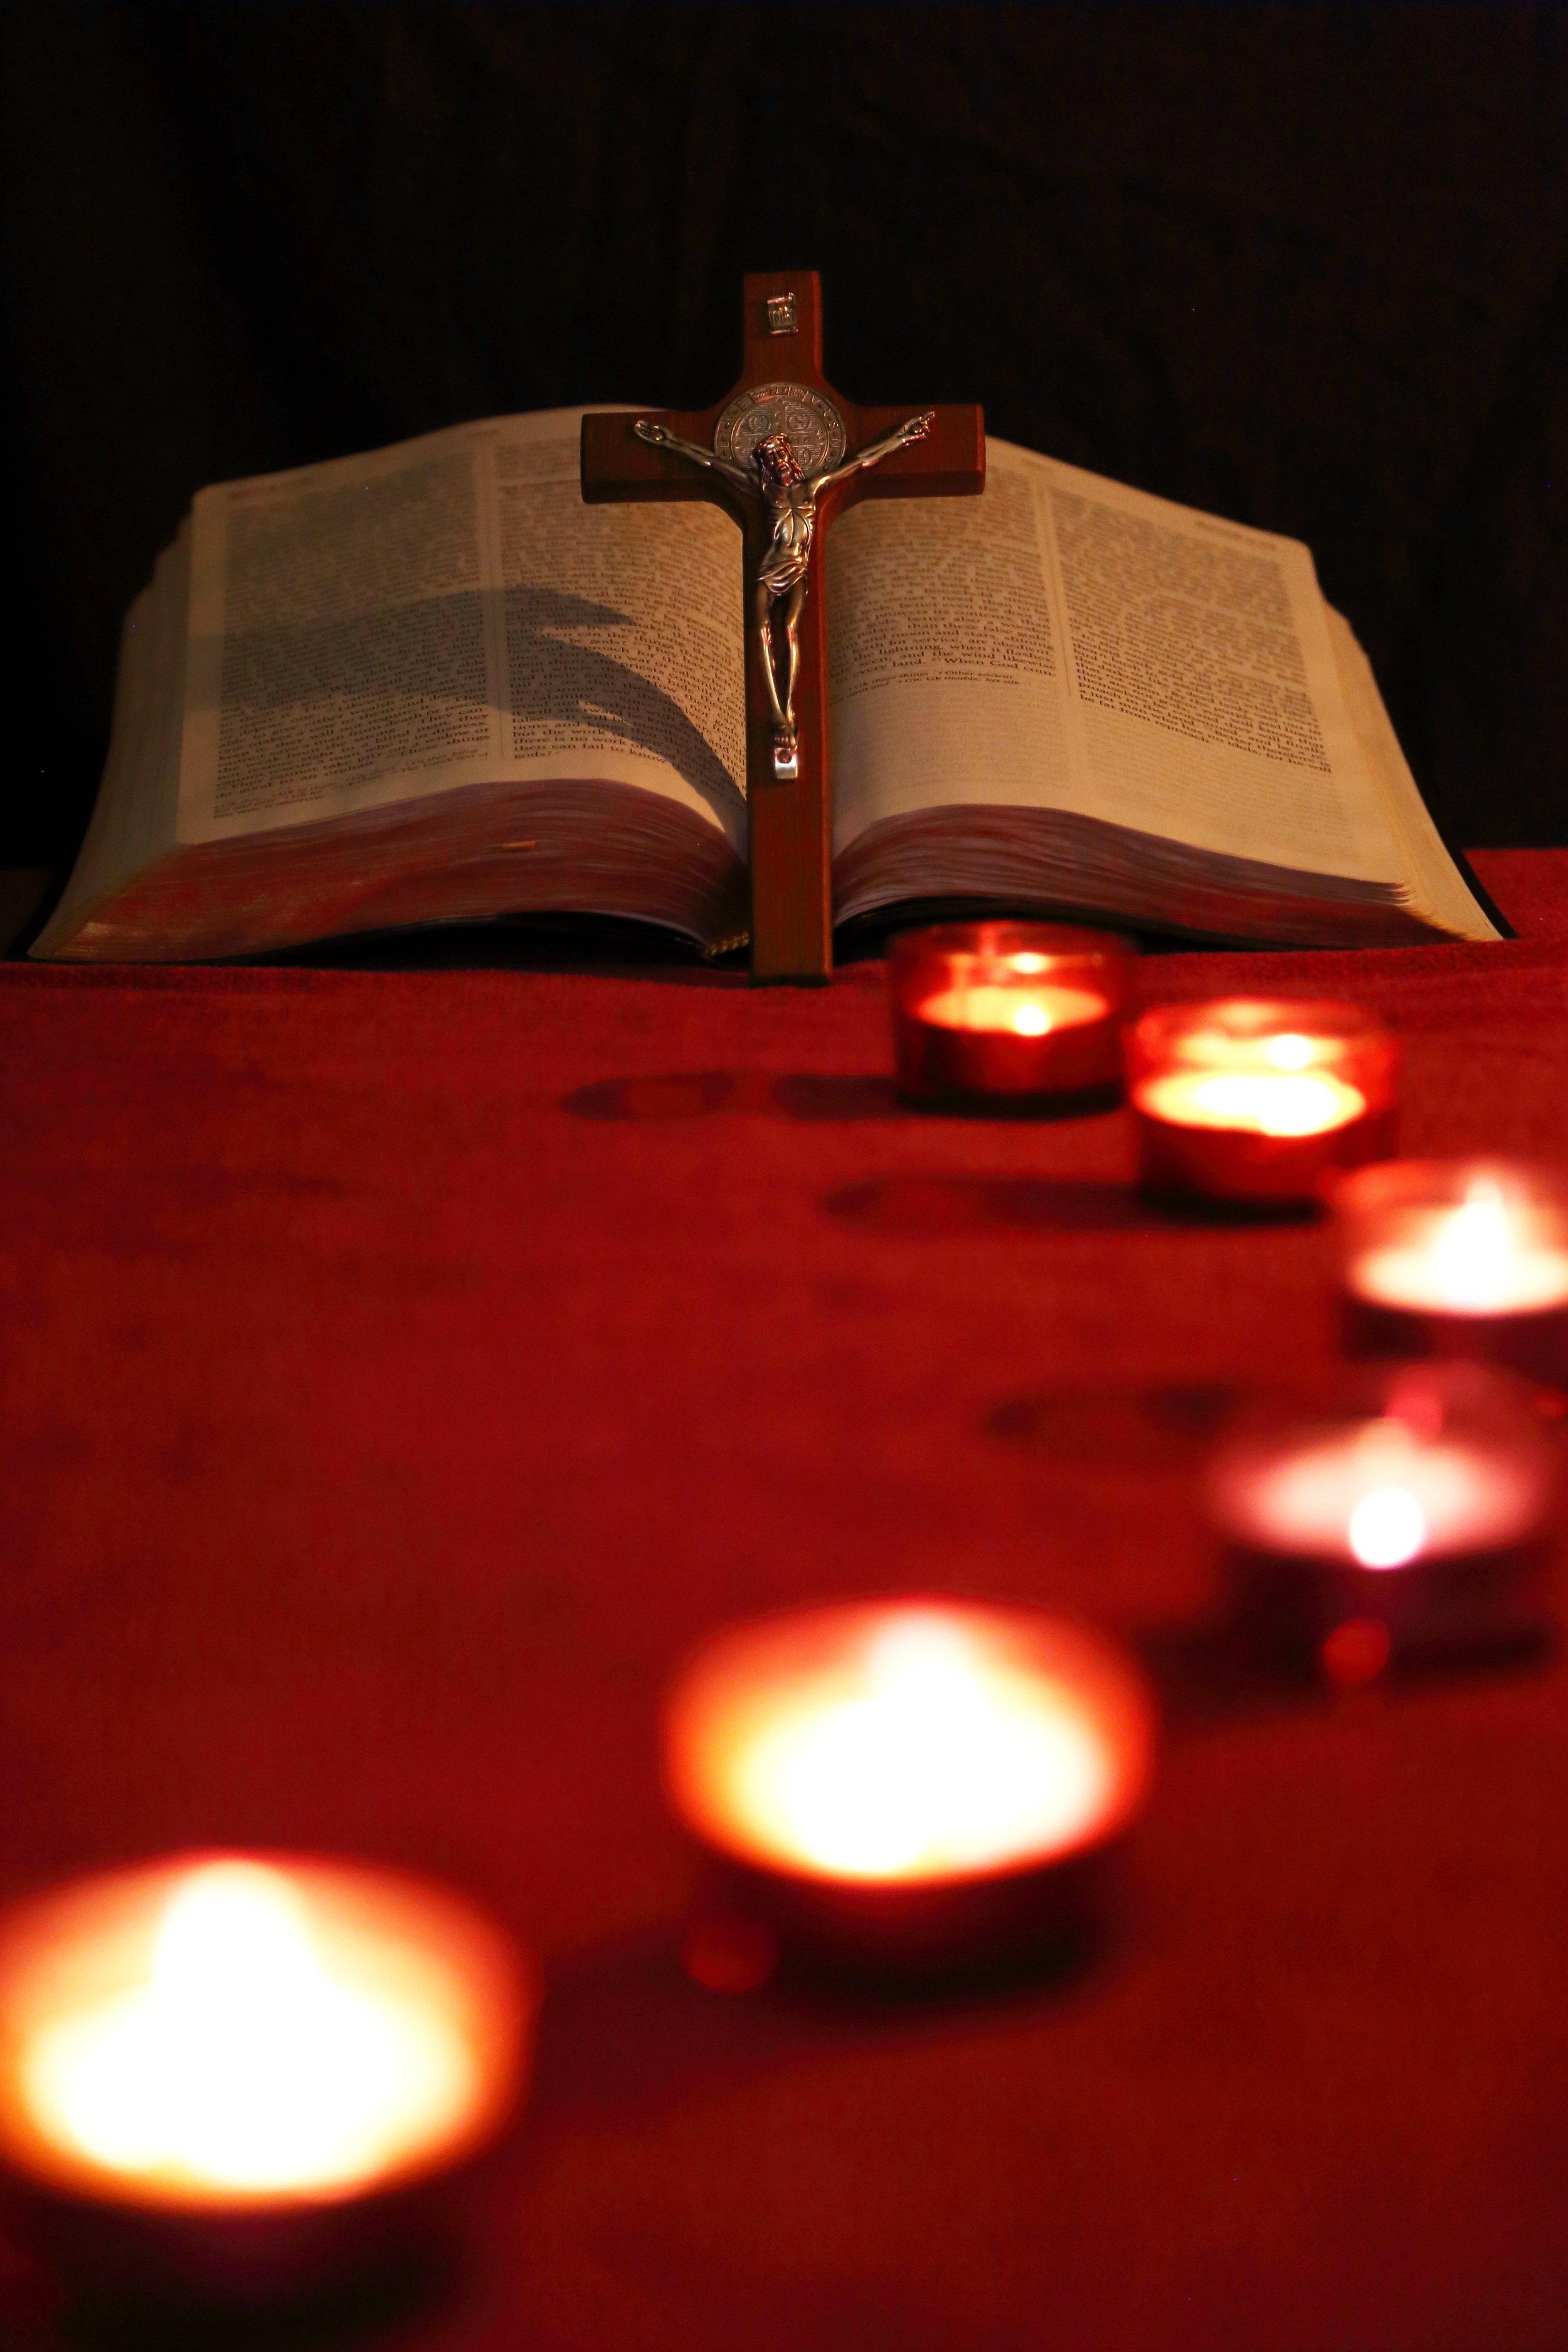 candle-706649.jpg